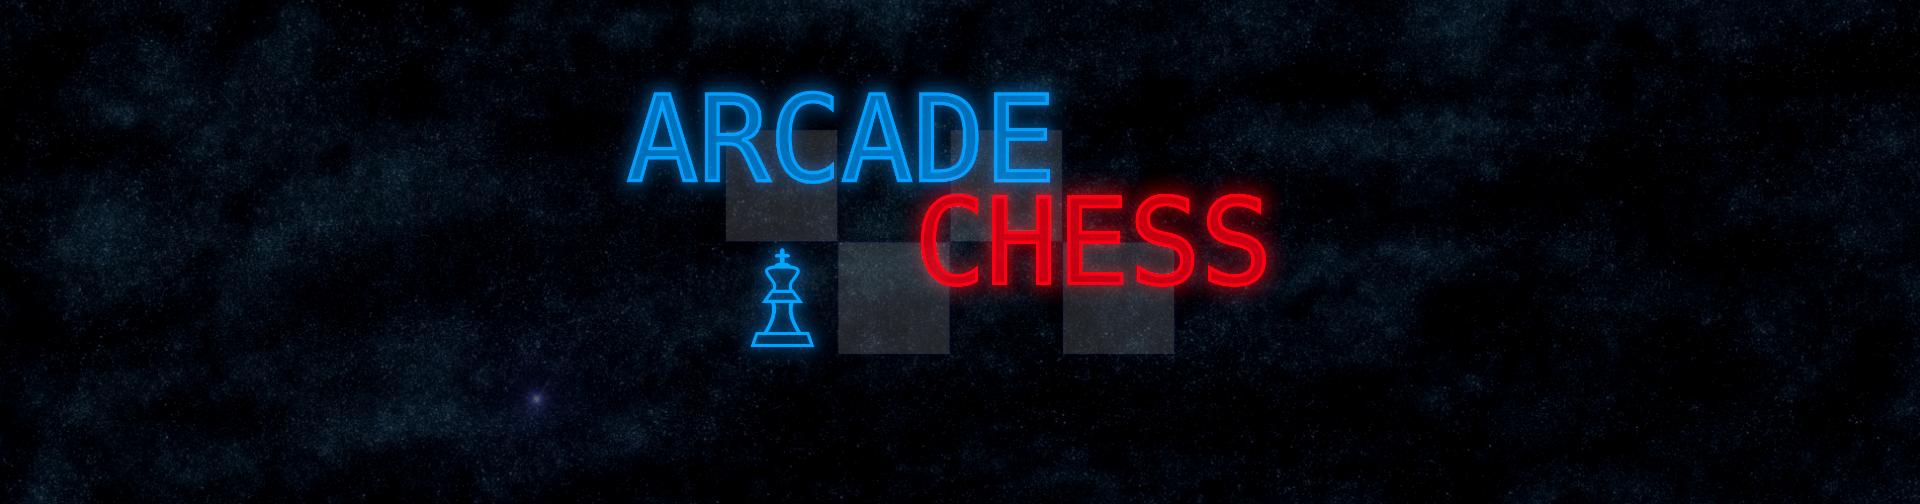 Arcade Chess